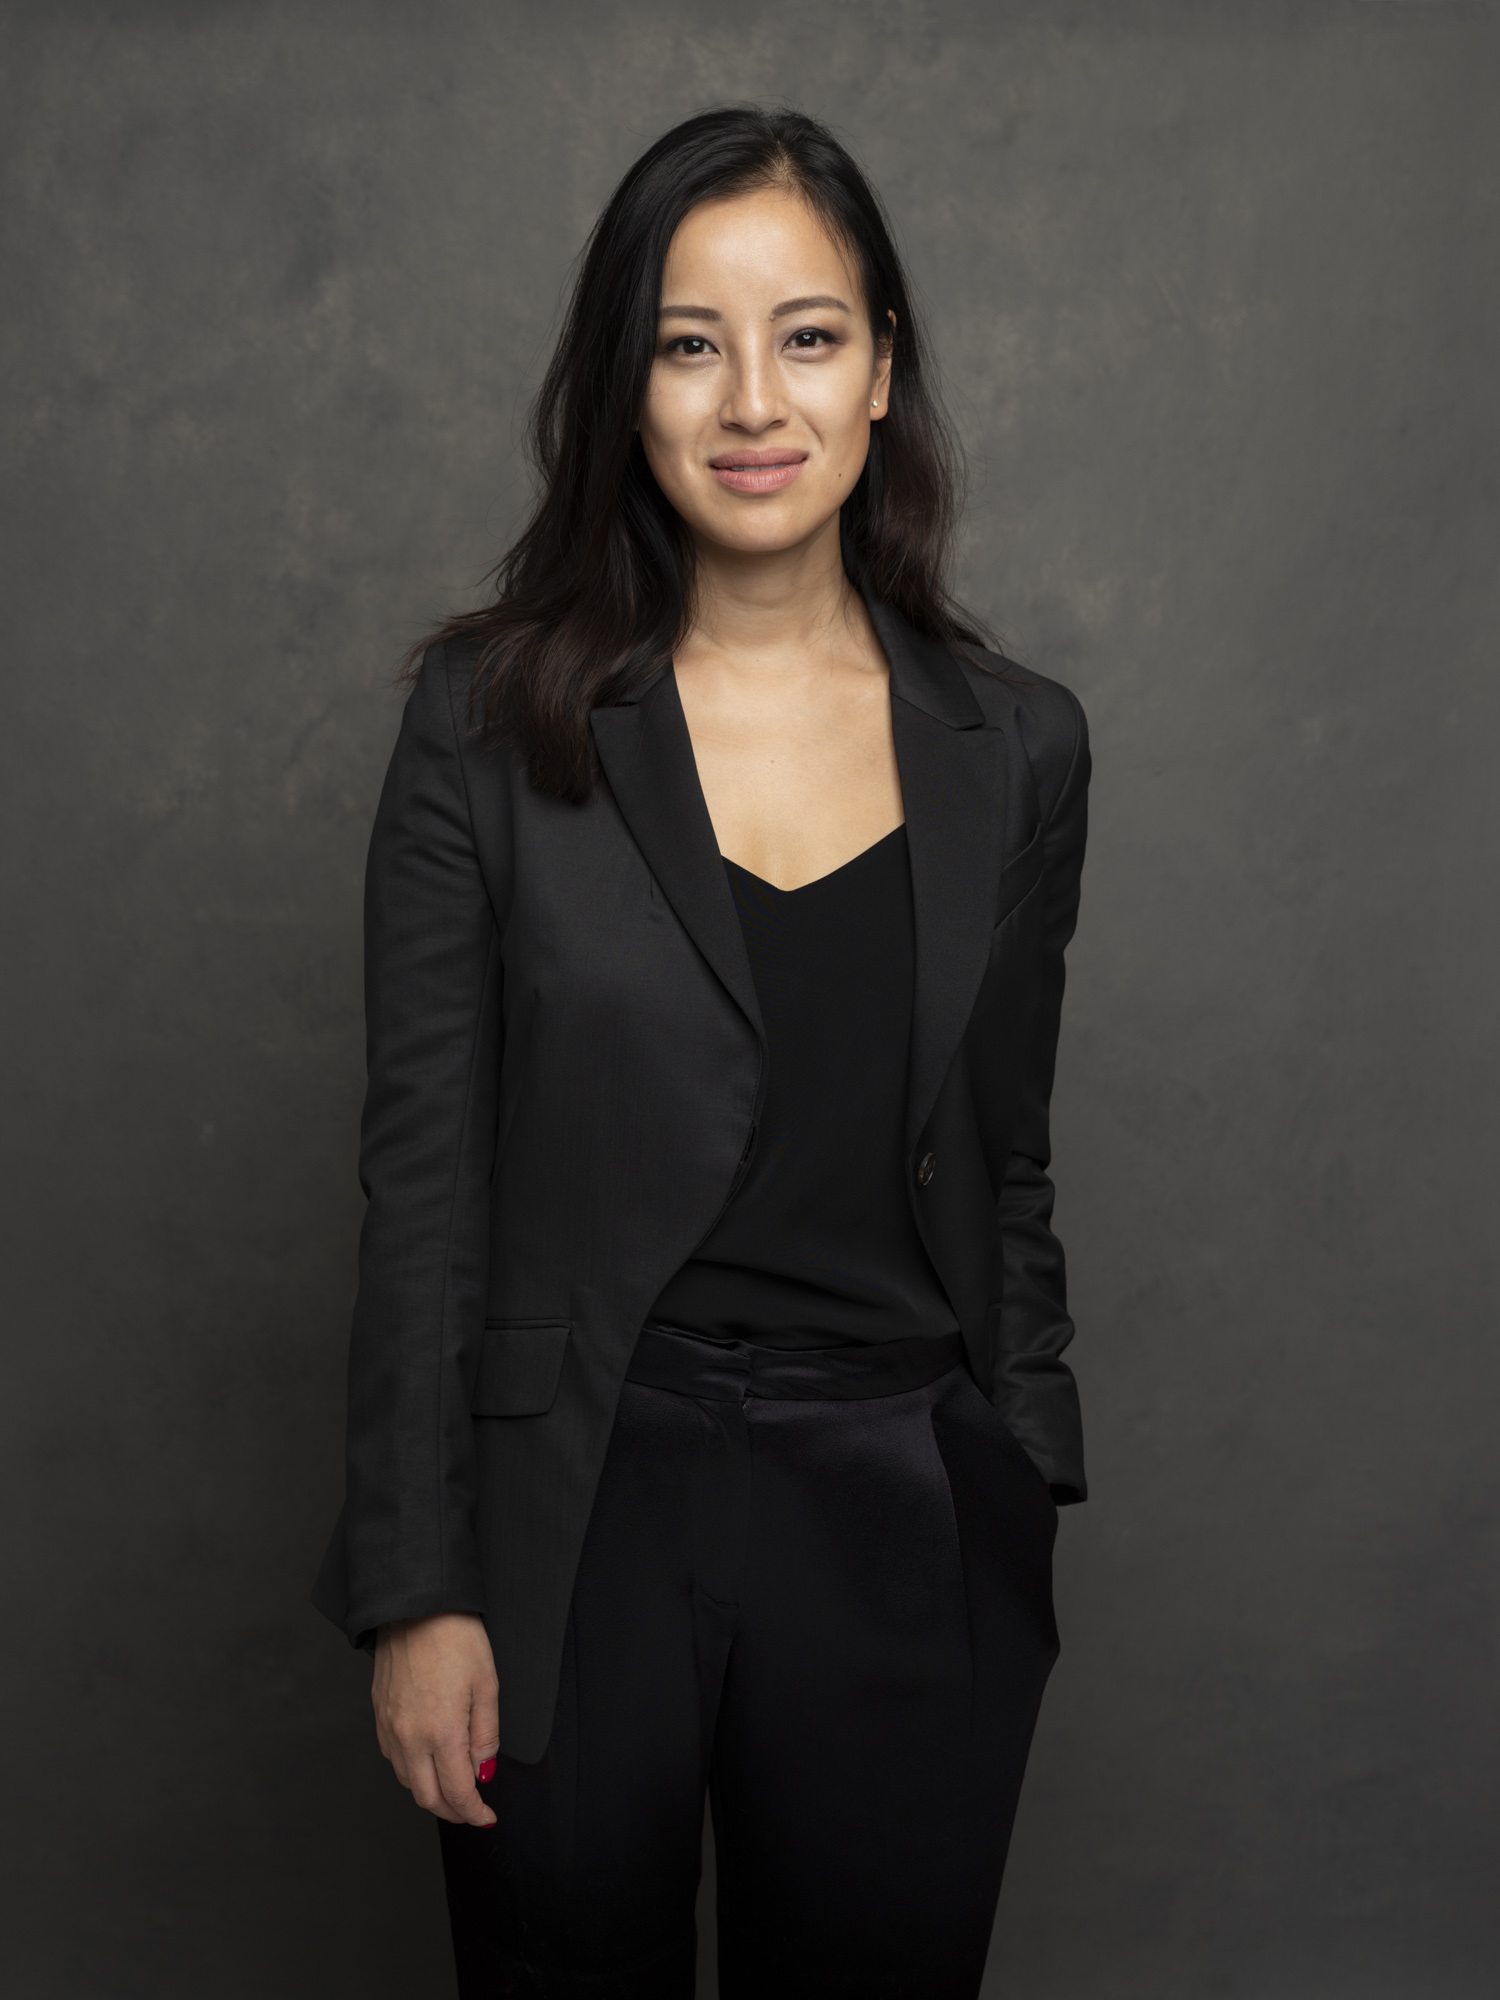 Corporate headshot portrait linkedin profil photography studio singapore services asia photographer lady